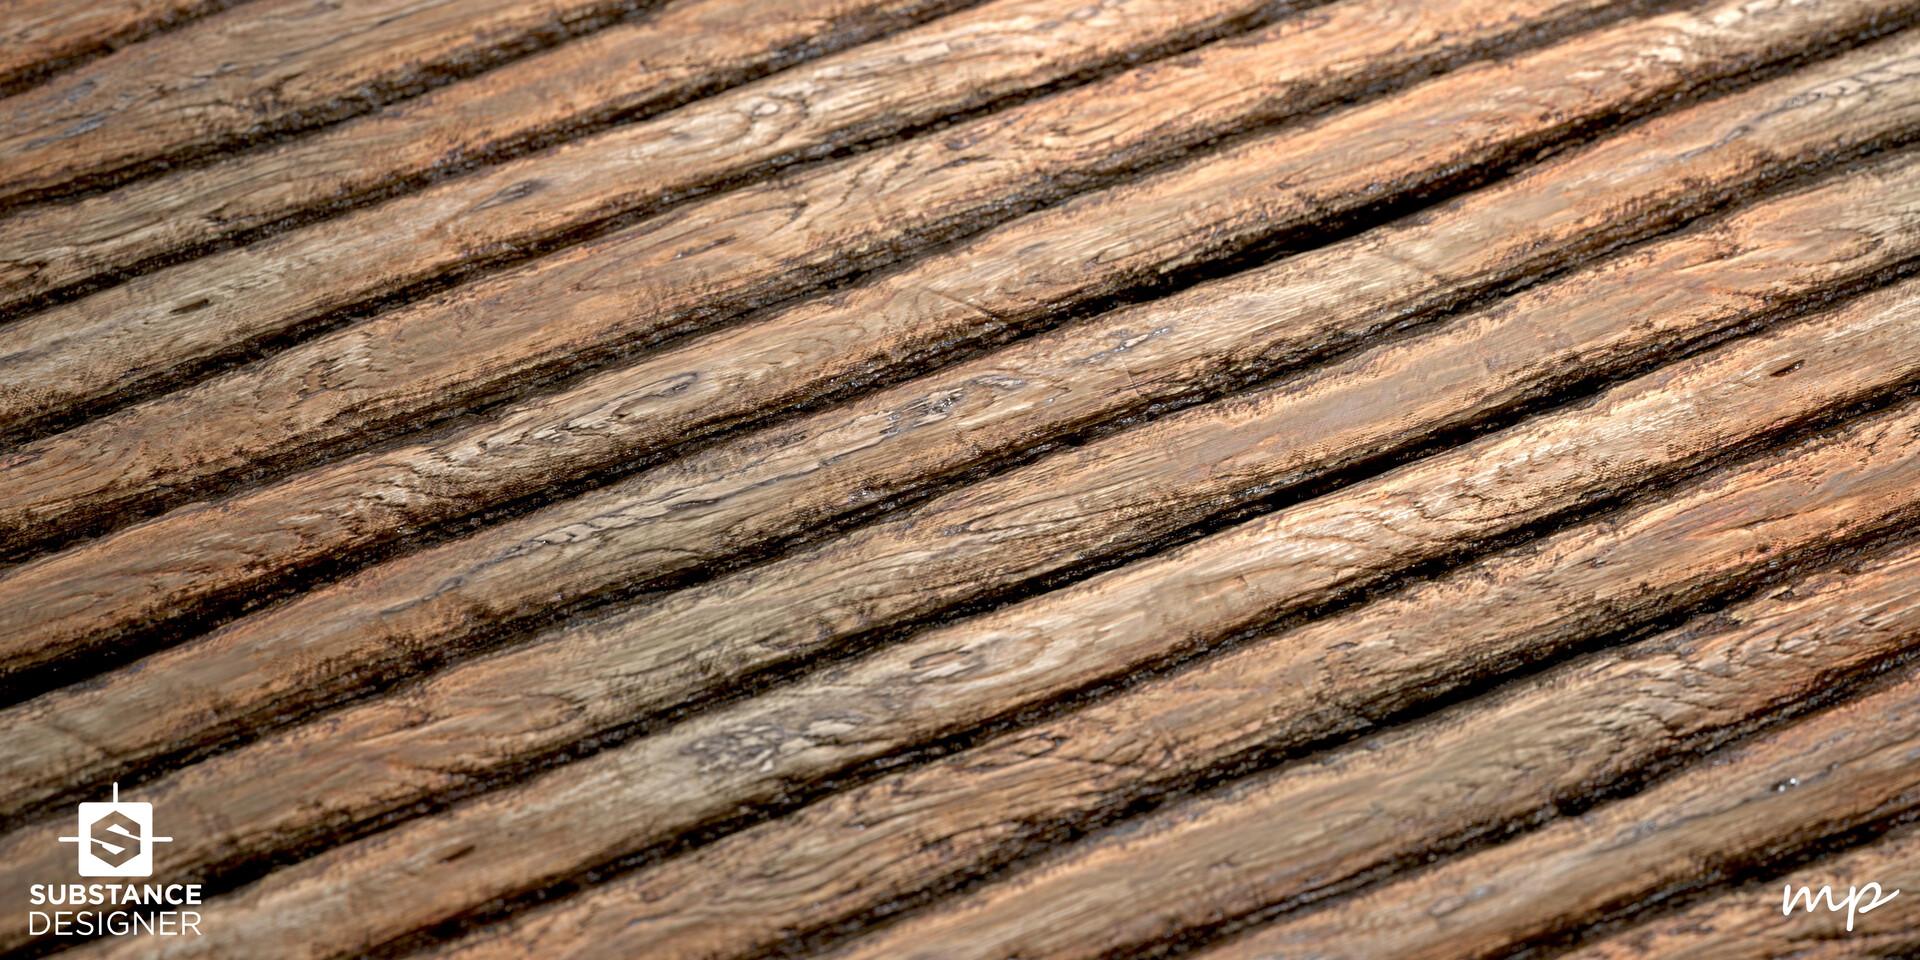 Martin pietras rustic wood rend 01